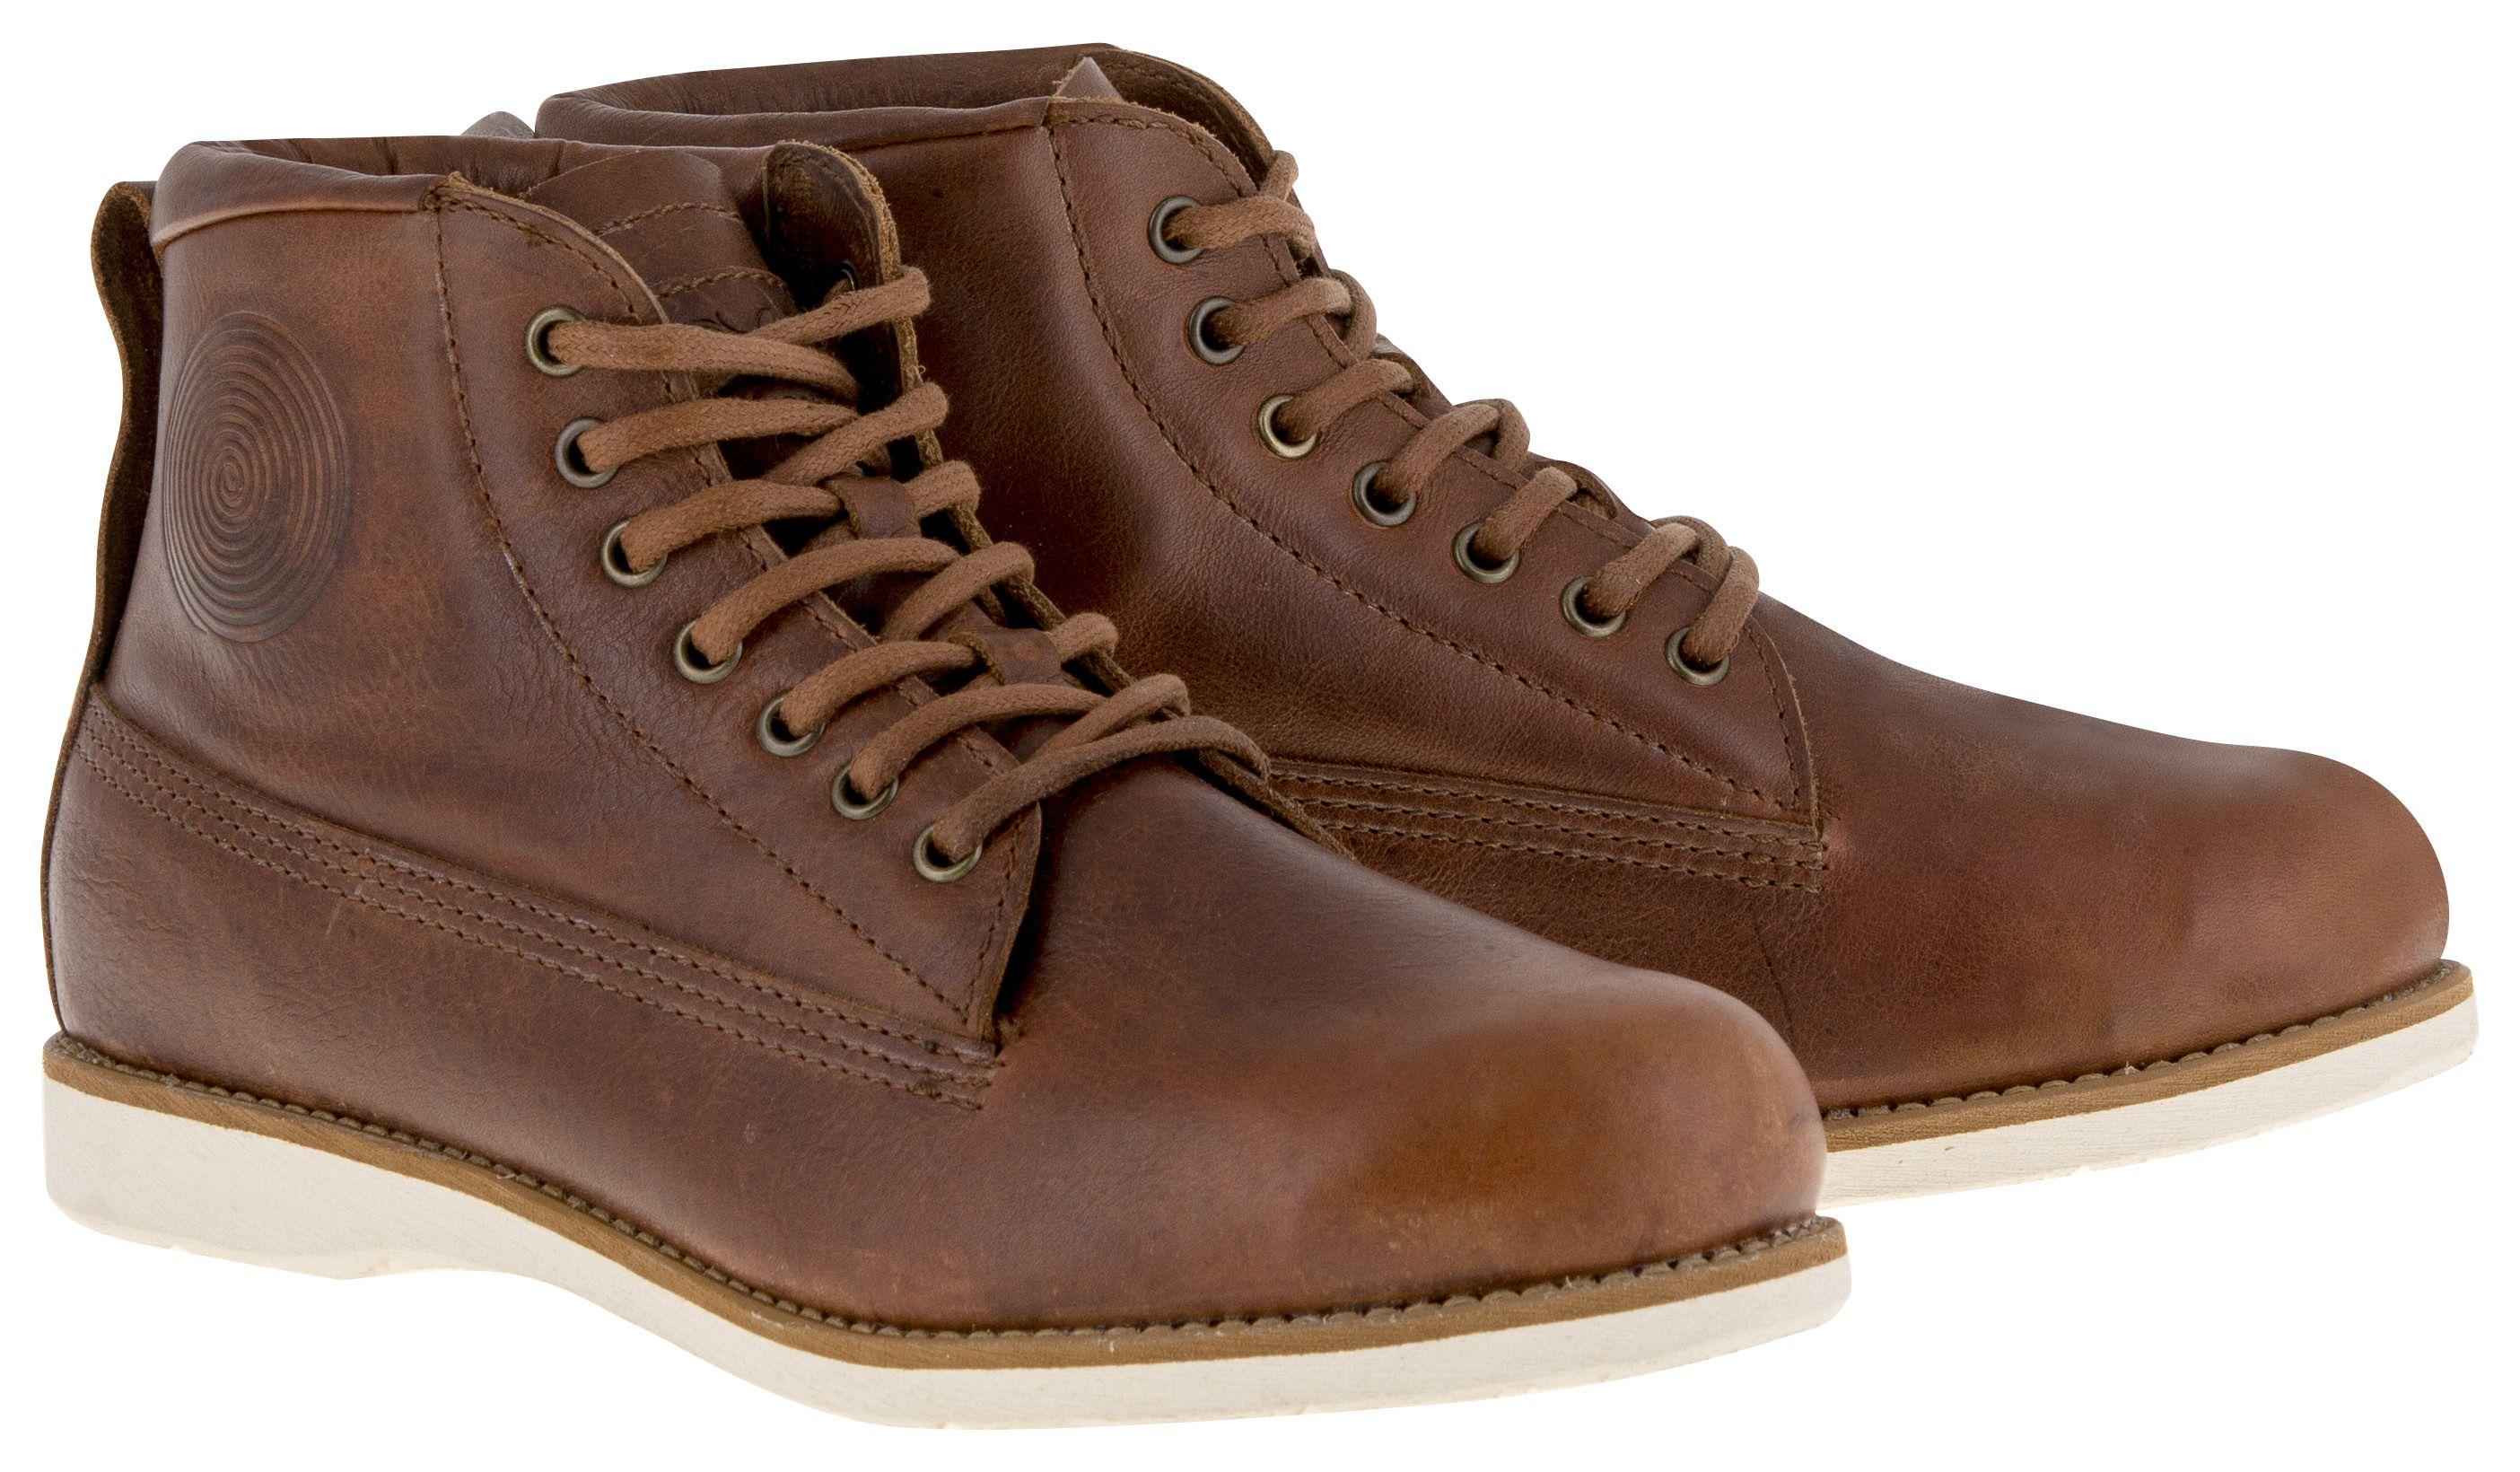 Alpinestars Oscar Rayburn Boots - RevZilla